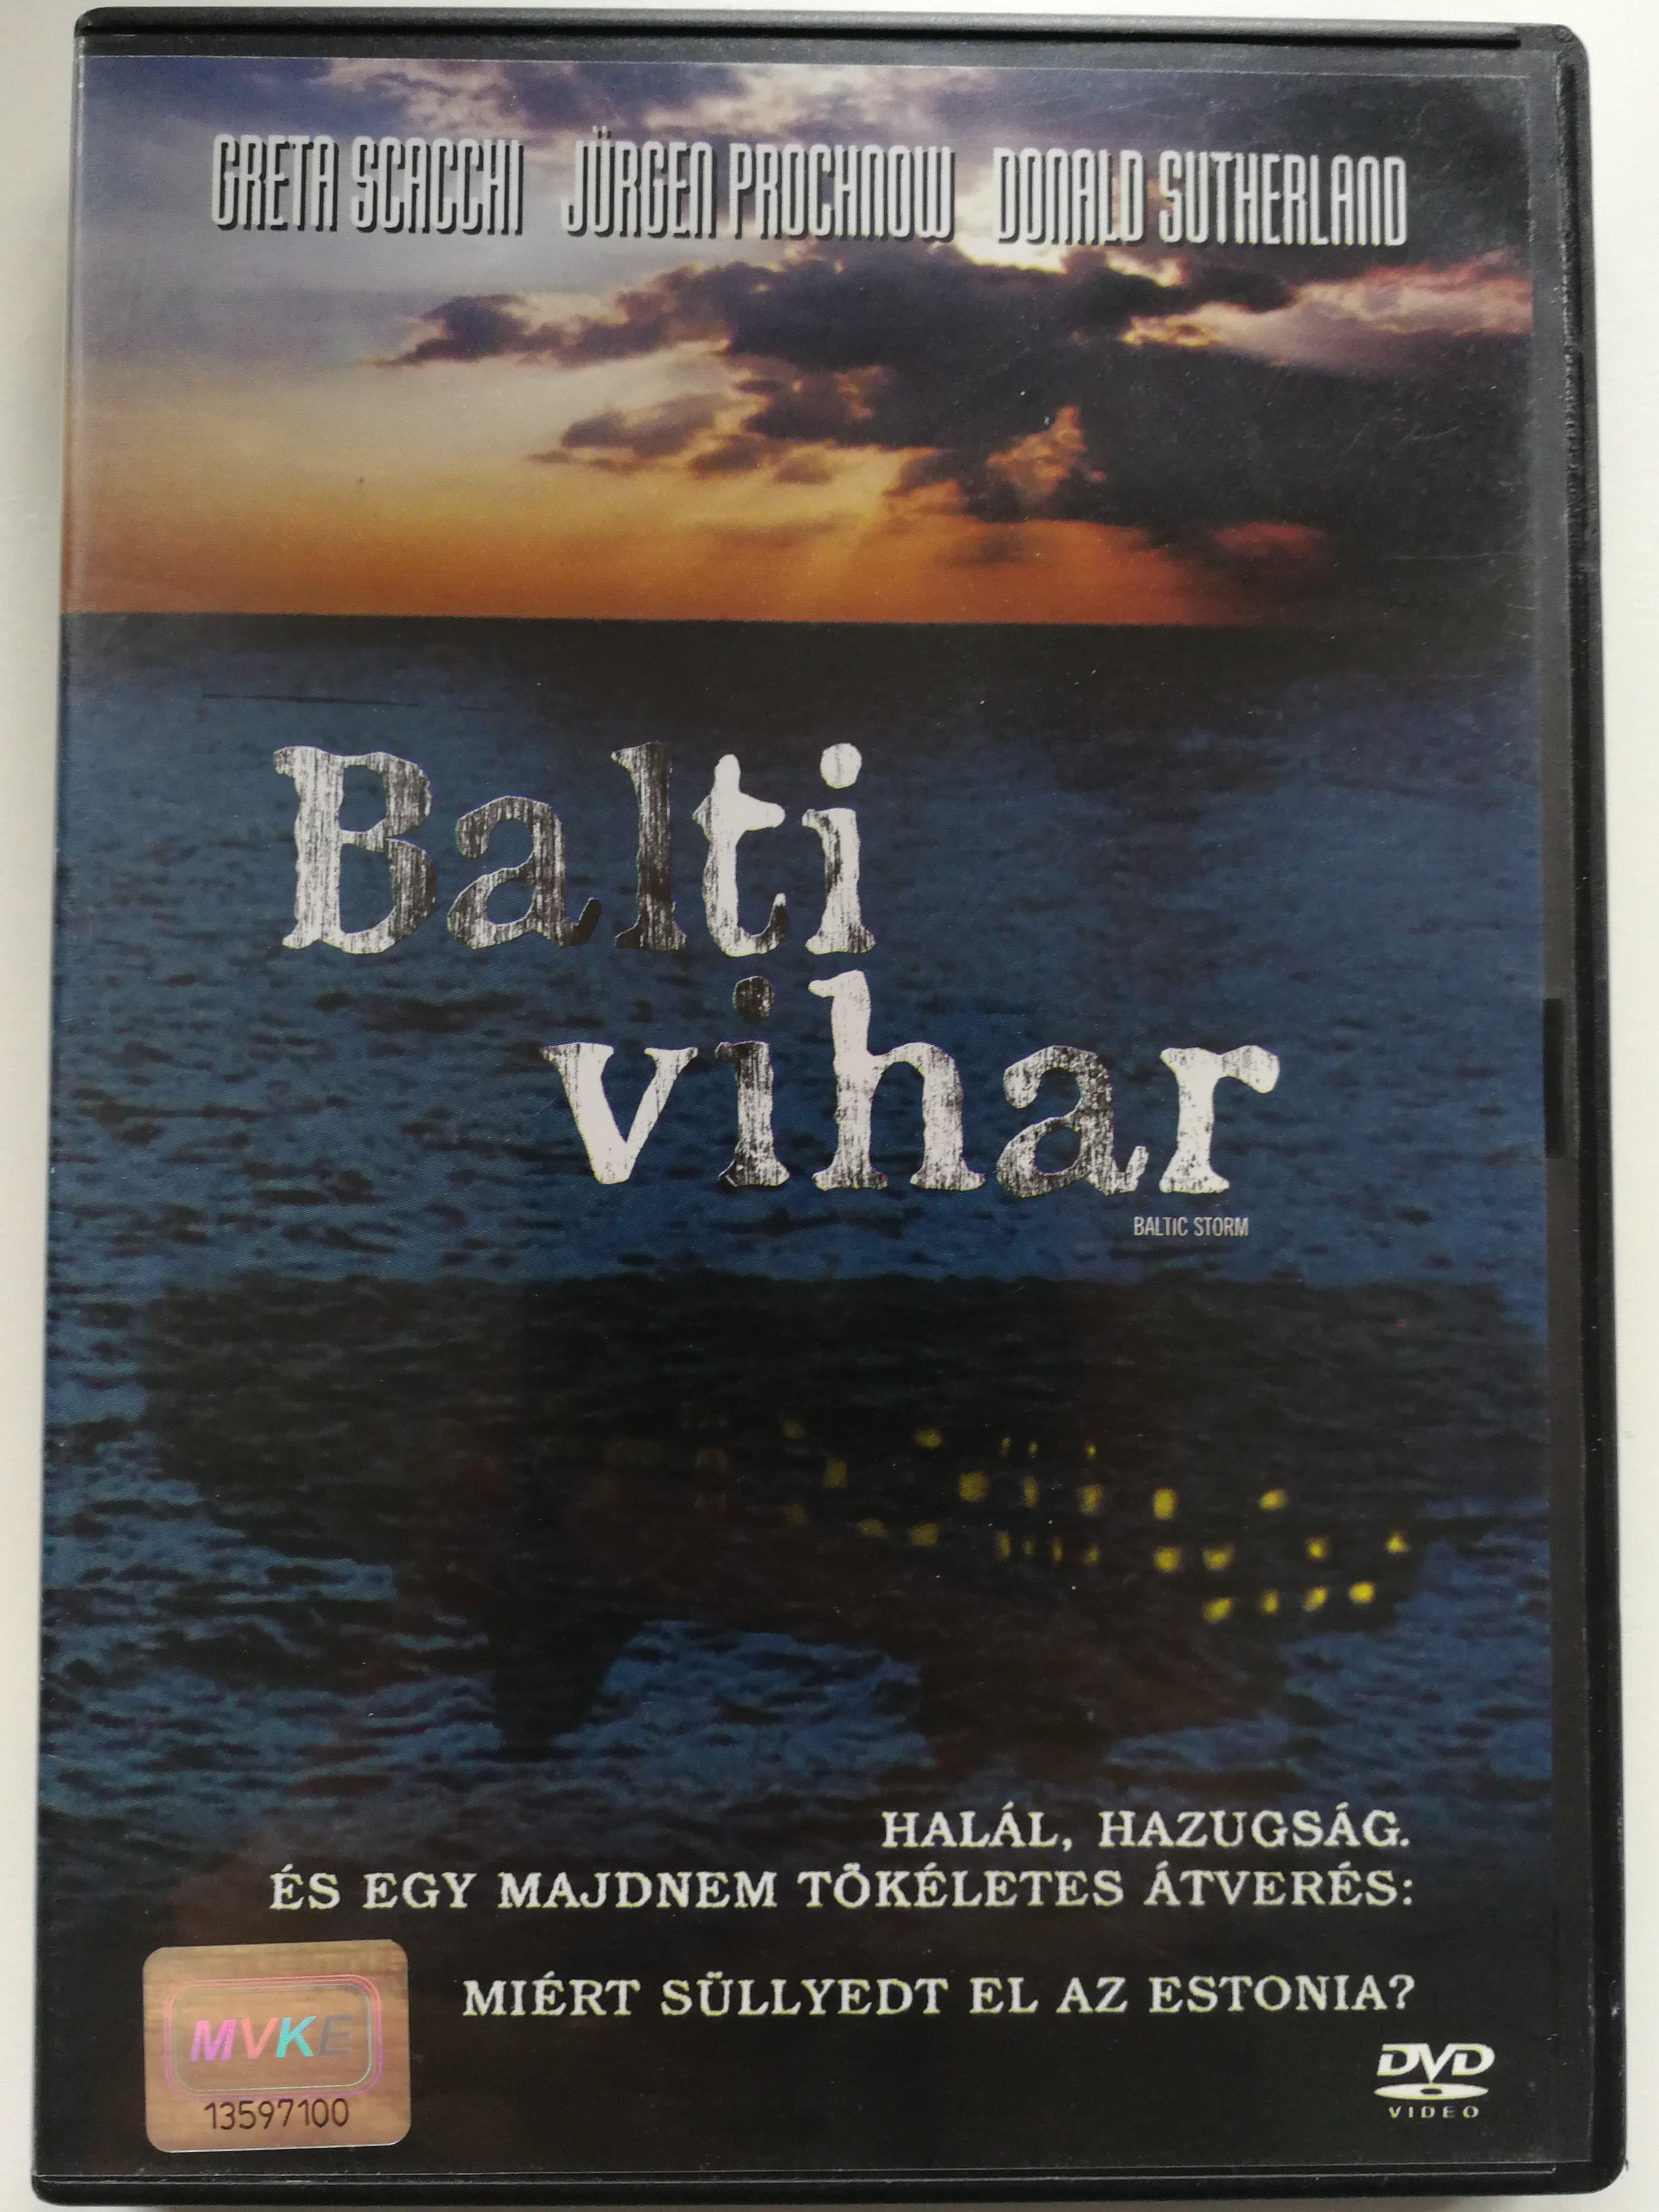 -baltic-storm-dvd-2003-balti-vihar-1.jpg